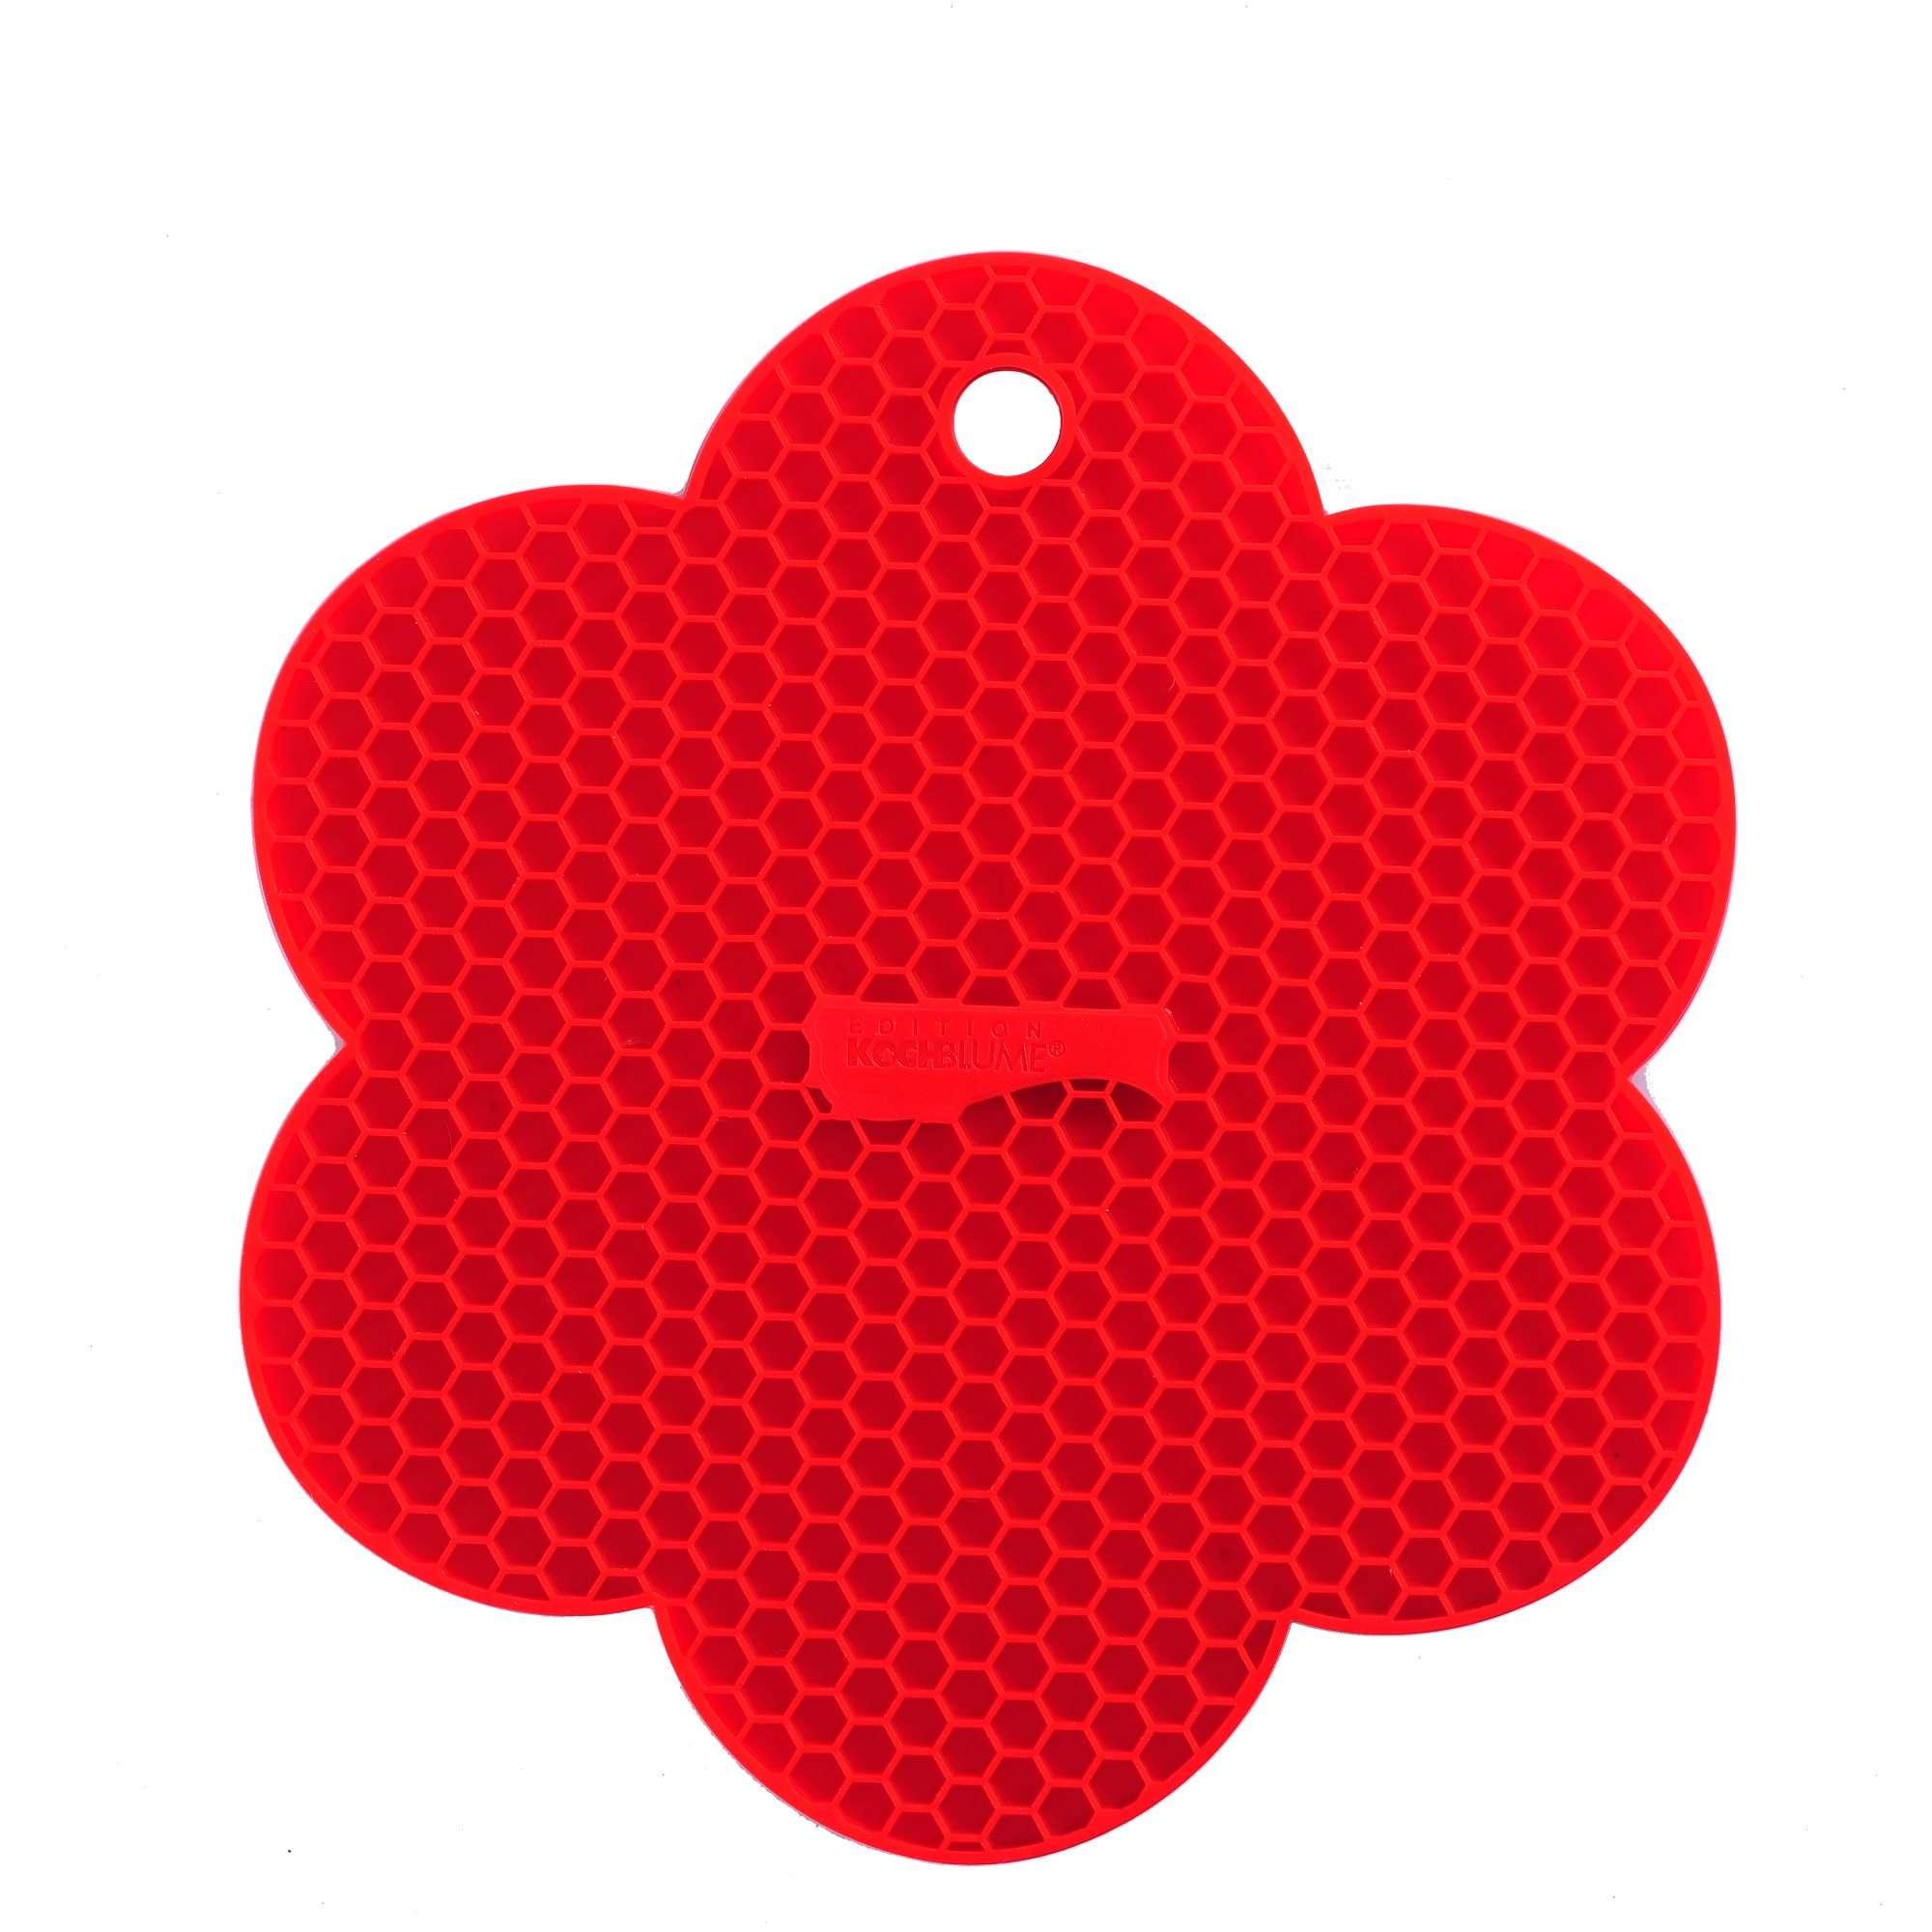 KOCHBLUME Waben-Untersetzer Blume LIMETTE Silikon Topflappen